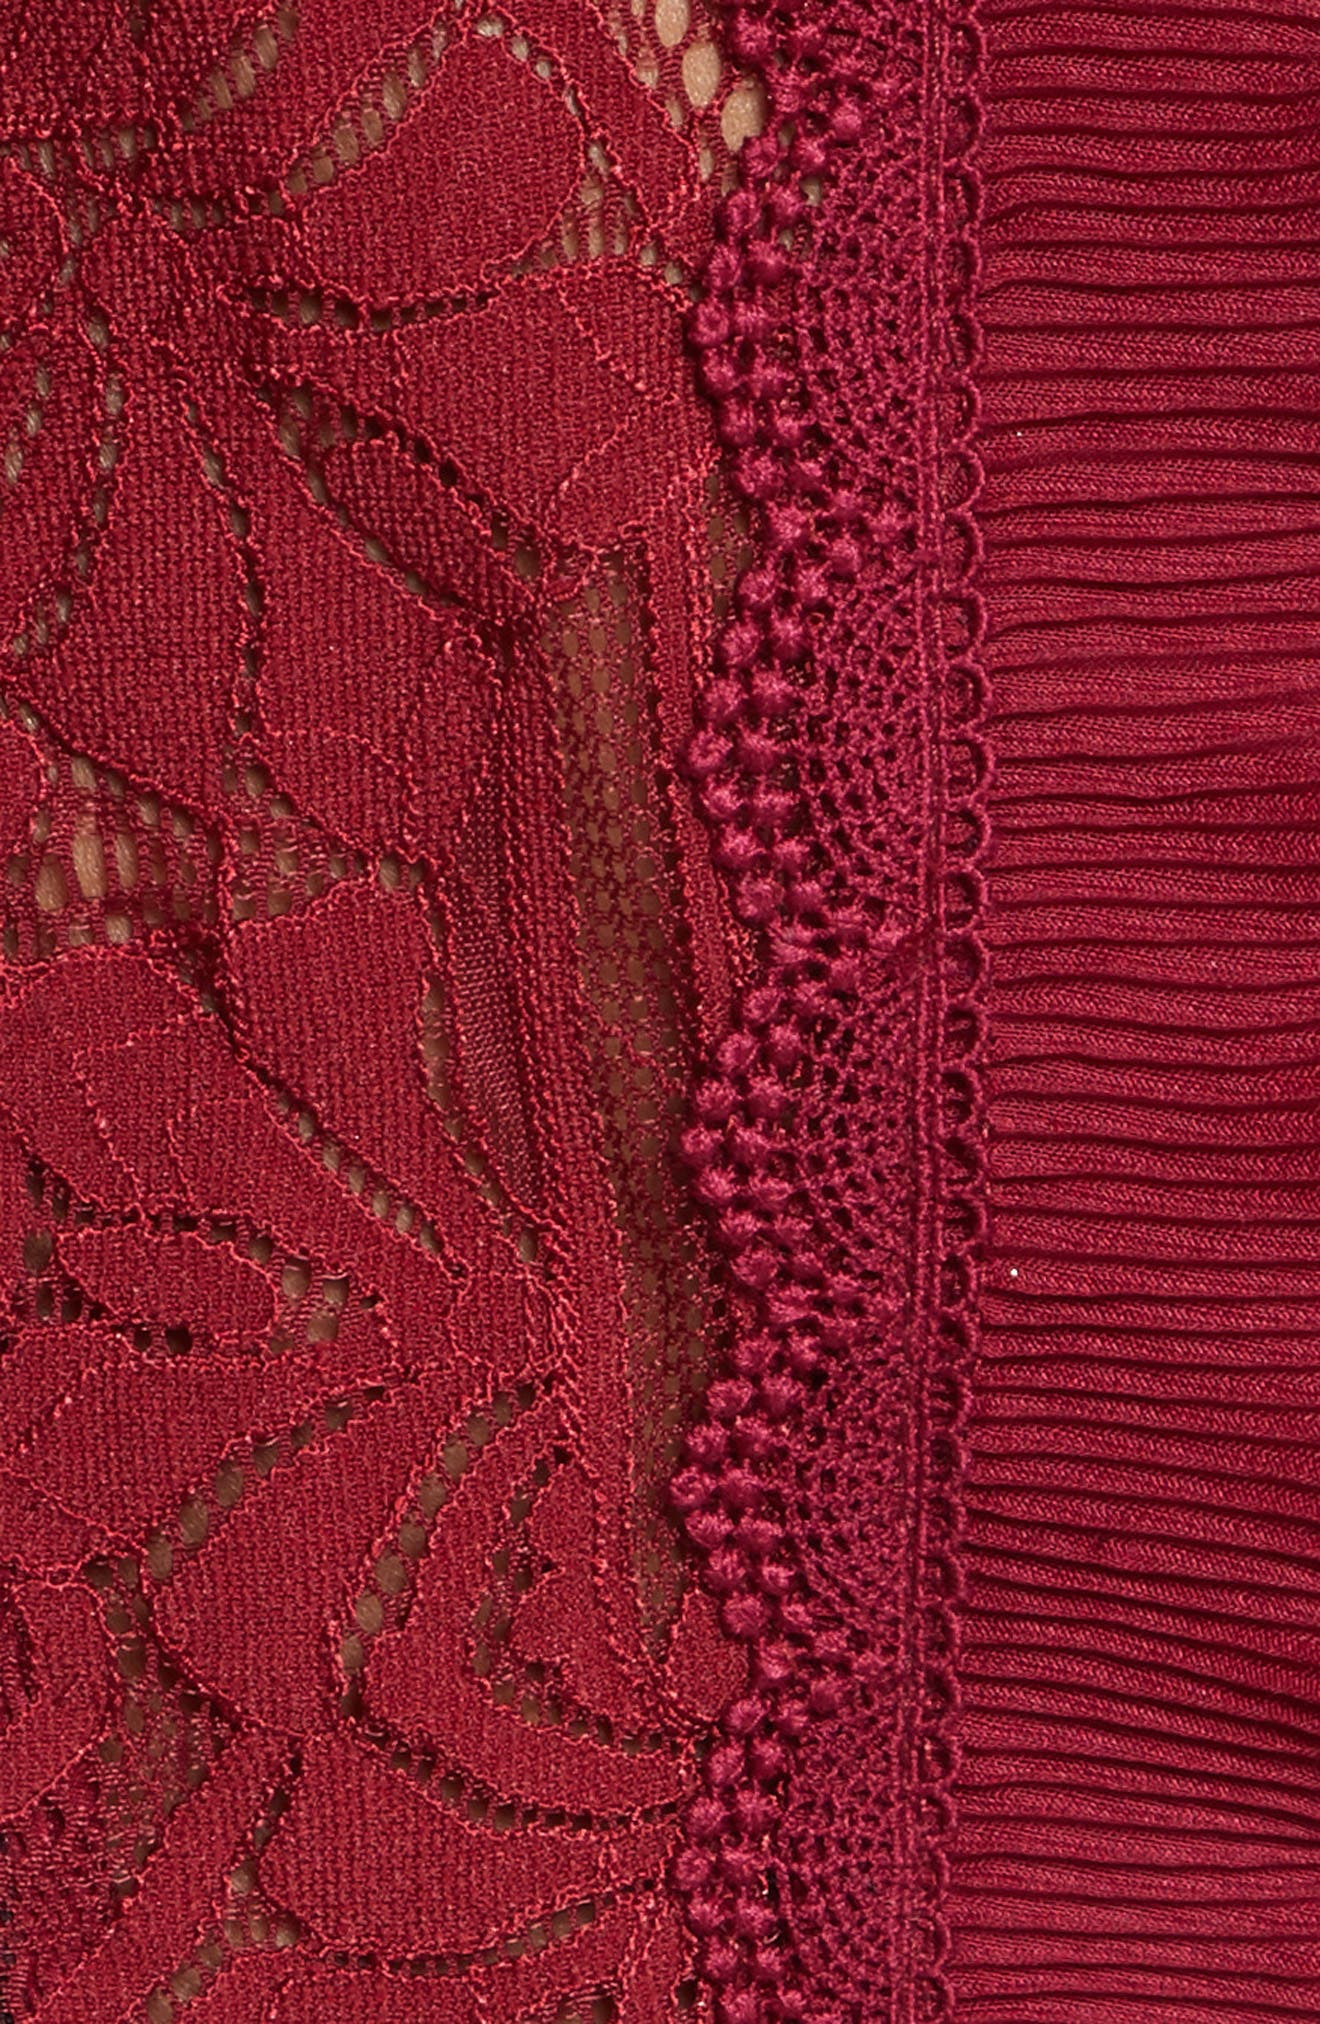 Tower Mesh Lace Ruffled Dress,                             Alternate thumbnail 5, color,                             604